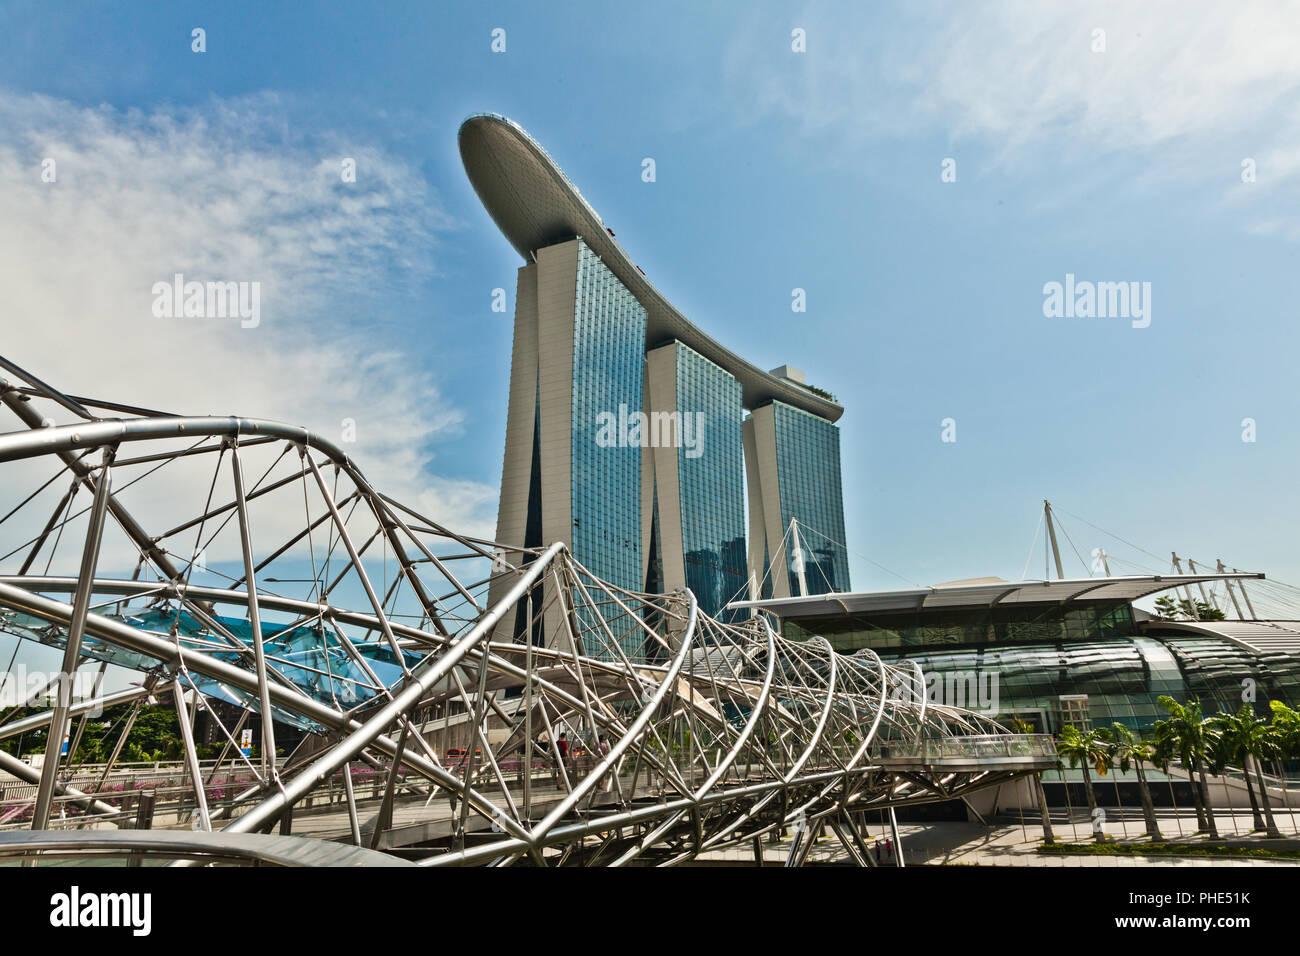 SANDS COMPLEX, MARINA BAY, SINGAPUR. - Stock Image